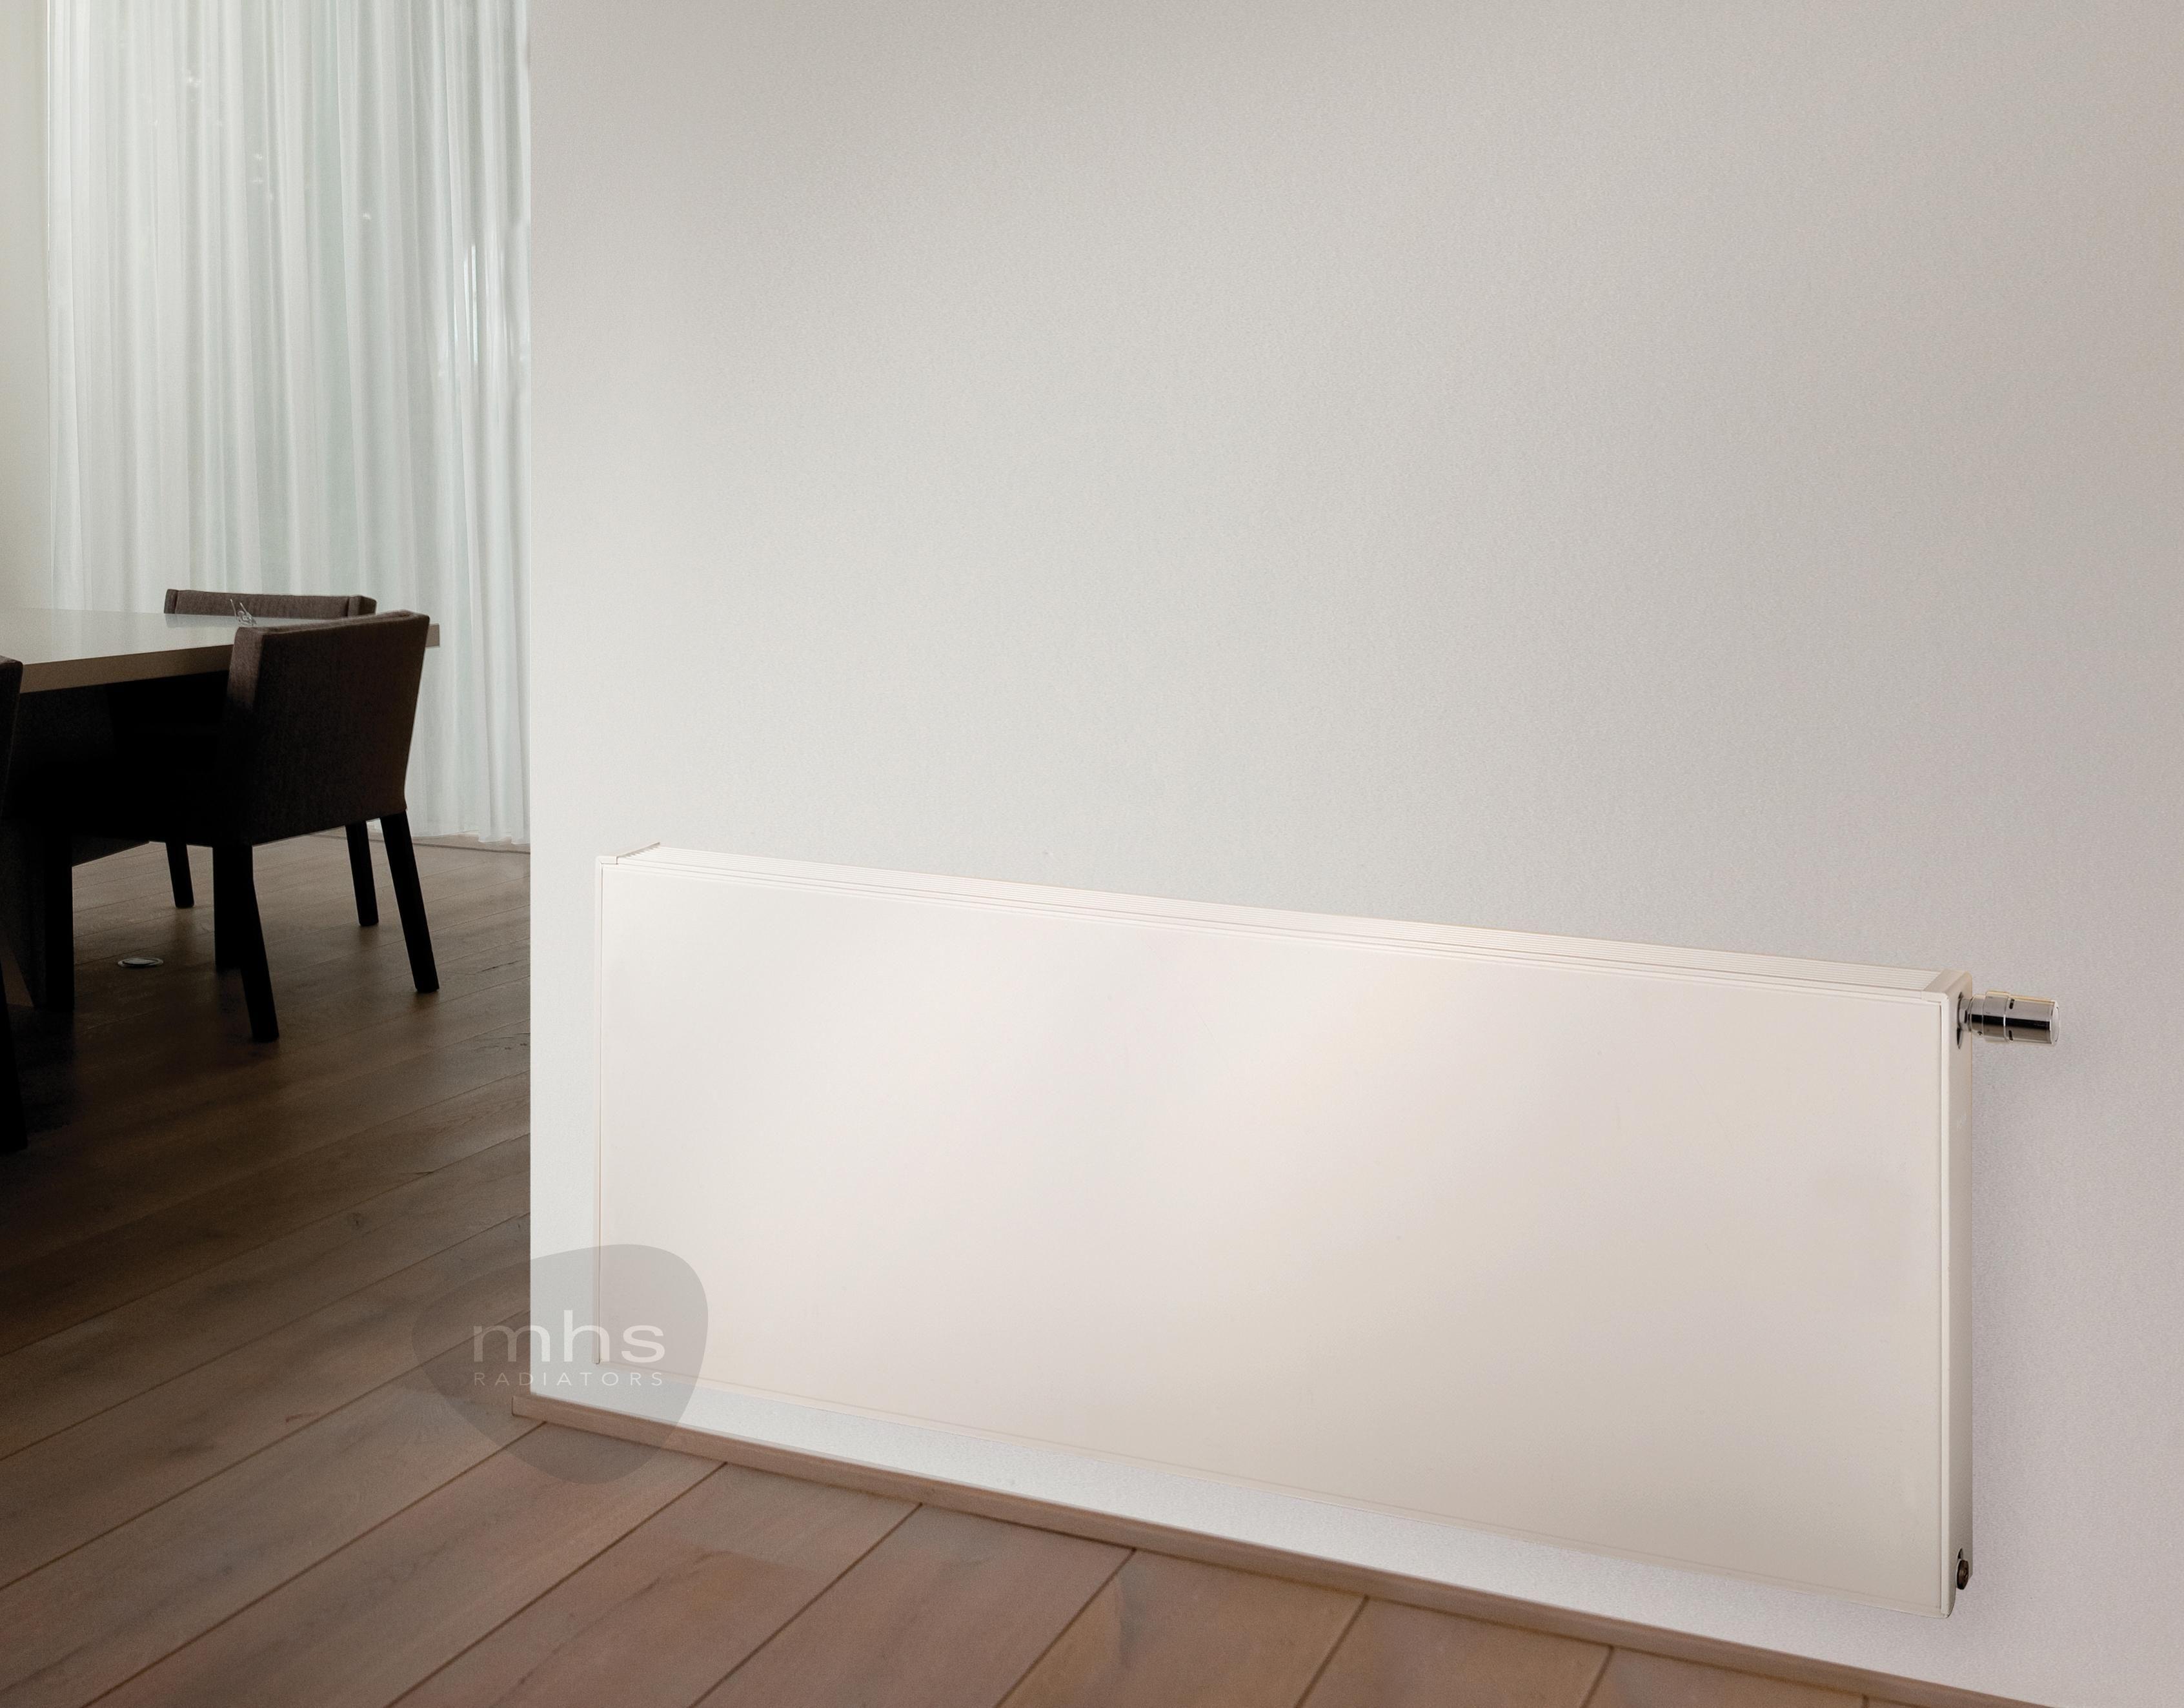 Best Planatherm 500 Height Double Horizontal Steel Flat Panel 640 x 480